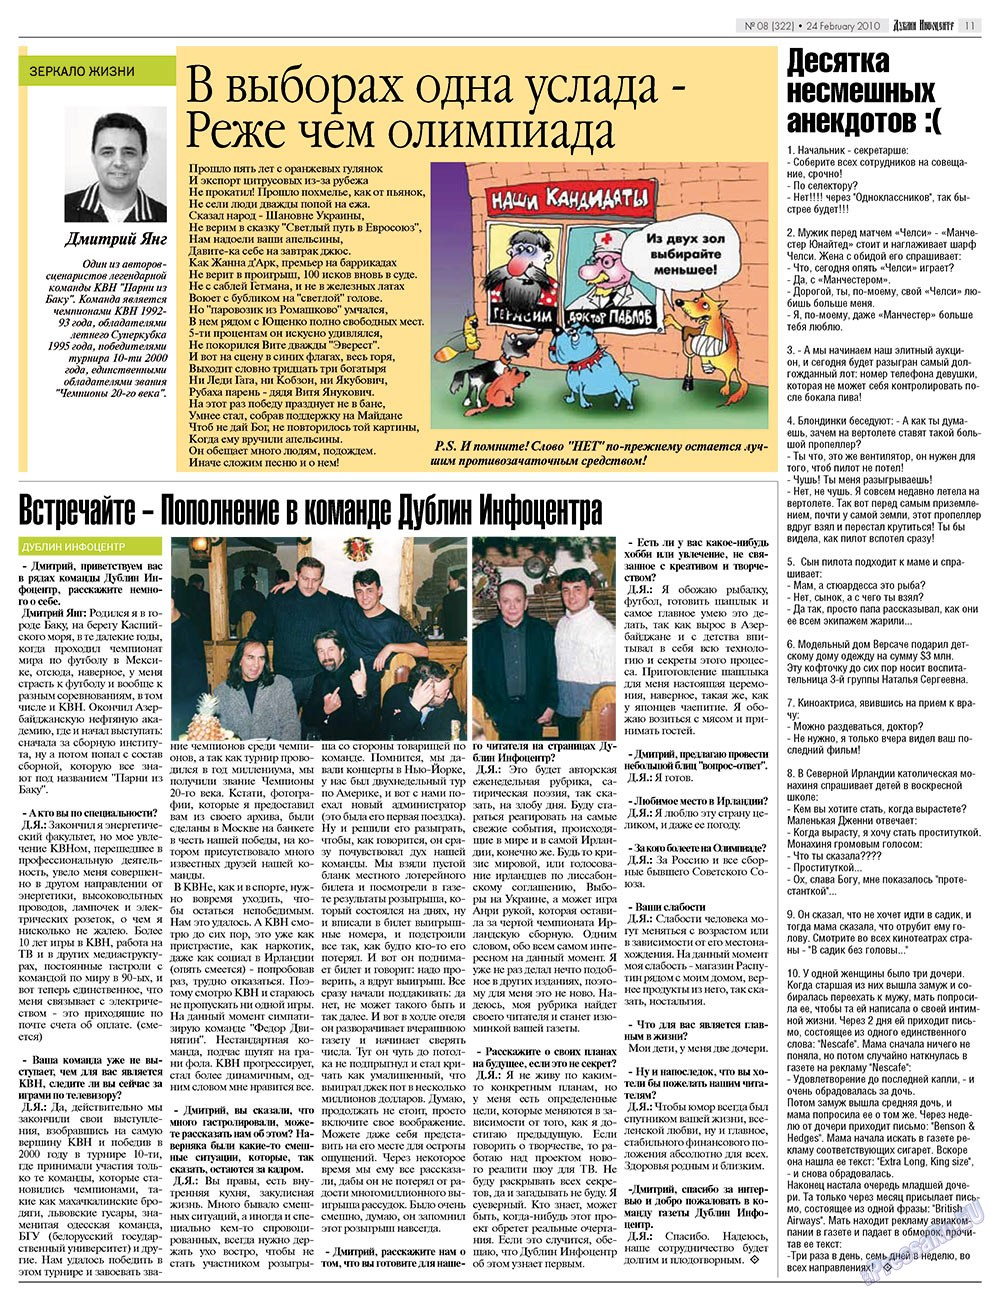 Дублин инфоцентр (газета). 2010 год, номер 8, стр. 11